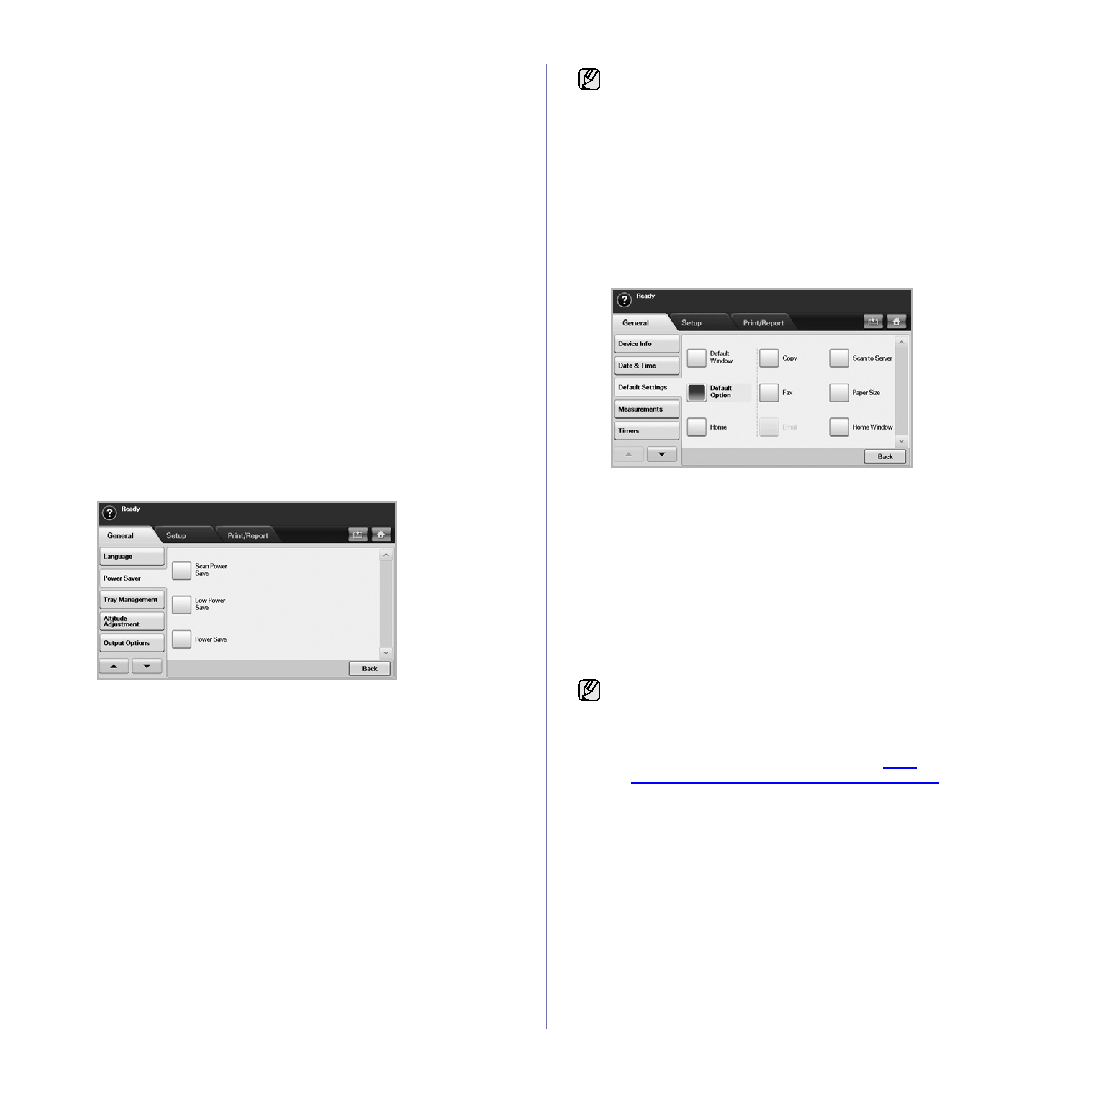 Samsung SCX-6555N User Manual (ver.3.00). Page 30, as of